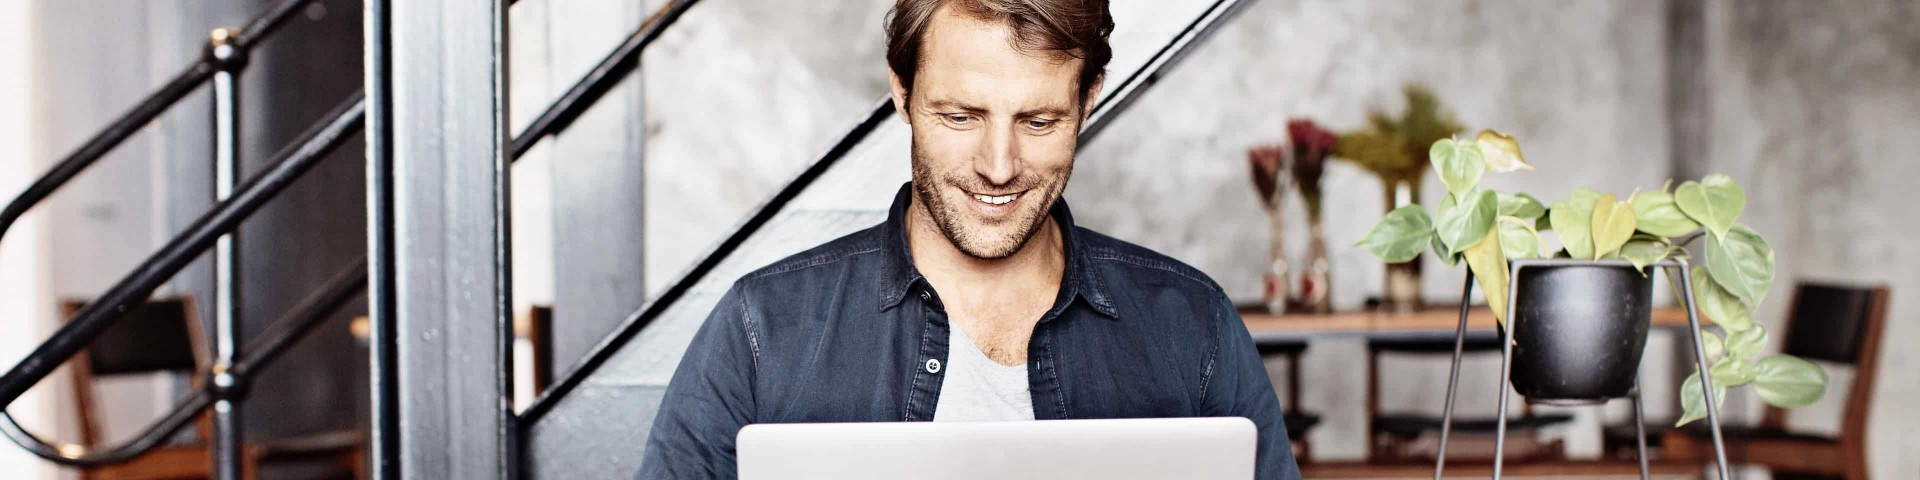 Mann vor dem Laptop